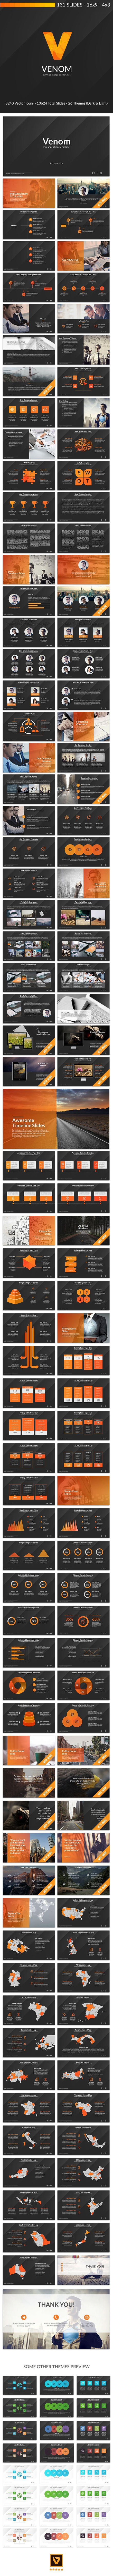 Venom - Multipurpose Powerpoint Template #design #slides Download: http://graphicriver.net/item/venom-multipurpose-powerpoint-template/13699253?ref=ksioks